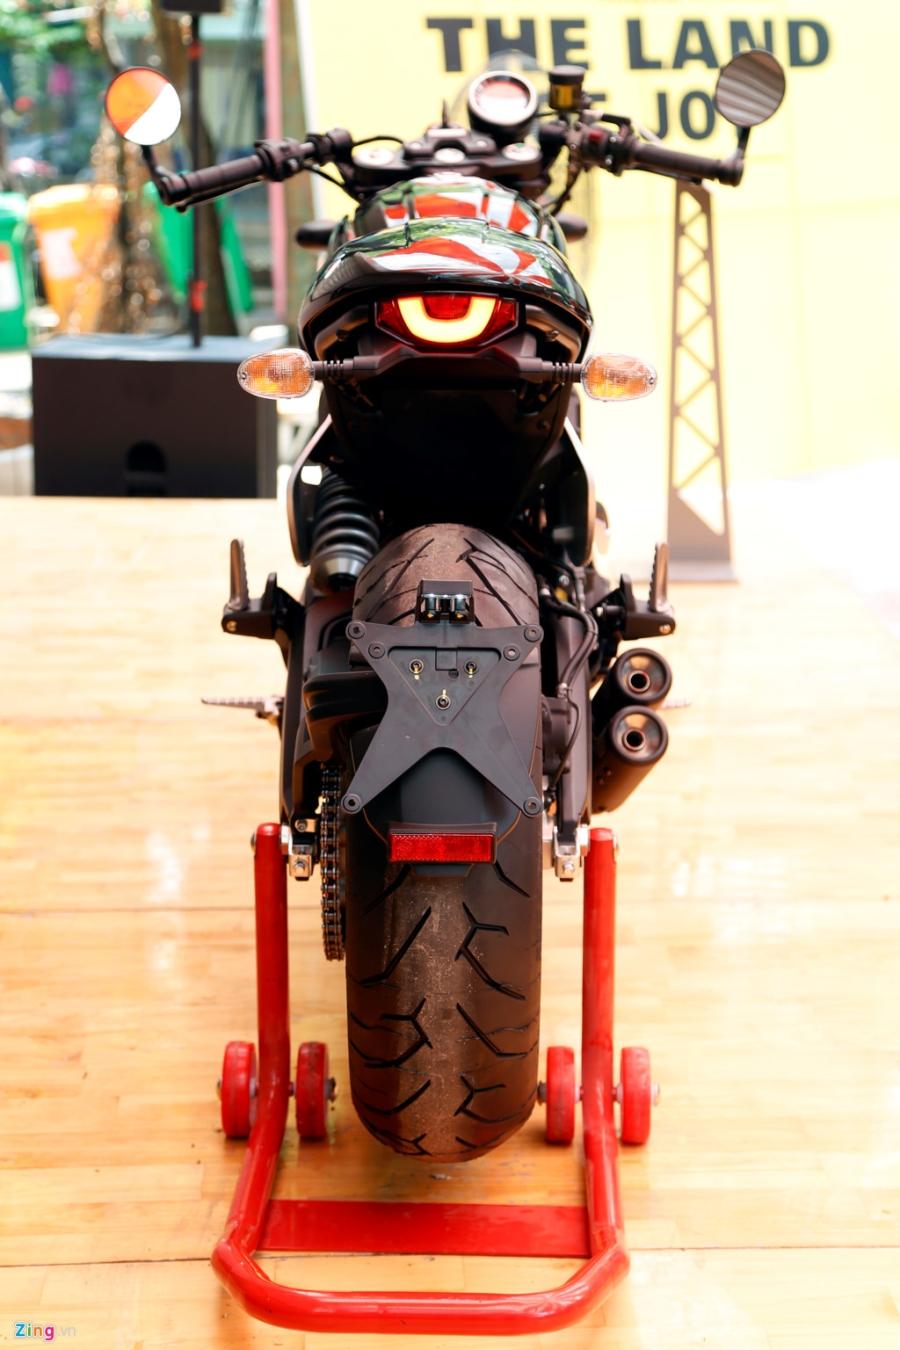 Chi tiet Ducati Scrambler Cafe Racer dau tien Viet Nam hinh anh 3